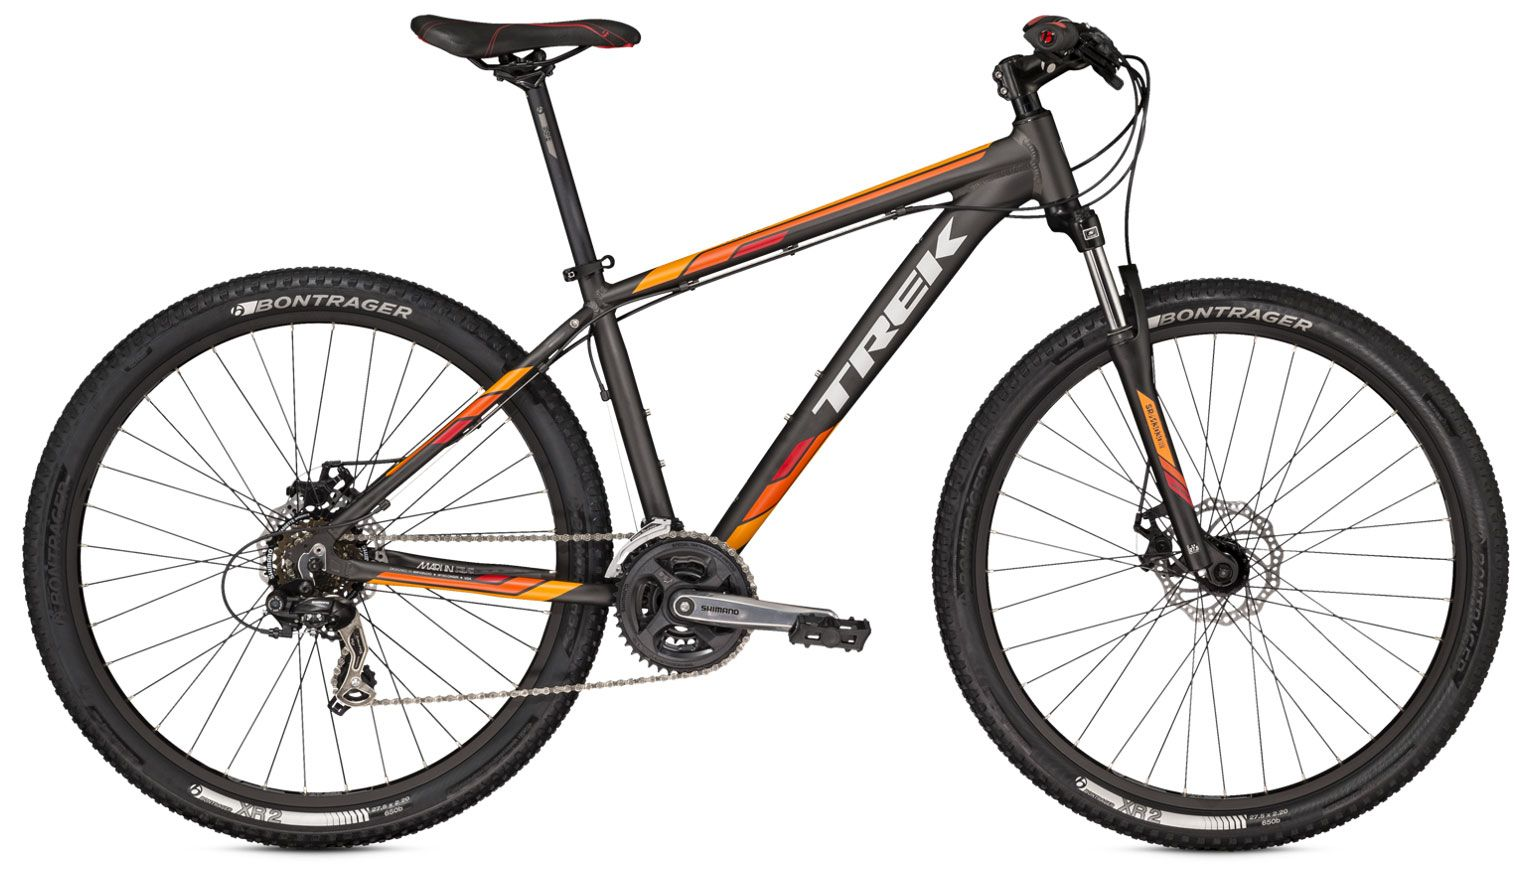 Велосипед Trek Marlin 5 29 2016 велосипед trek marlin 5 29 2016